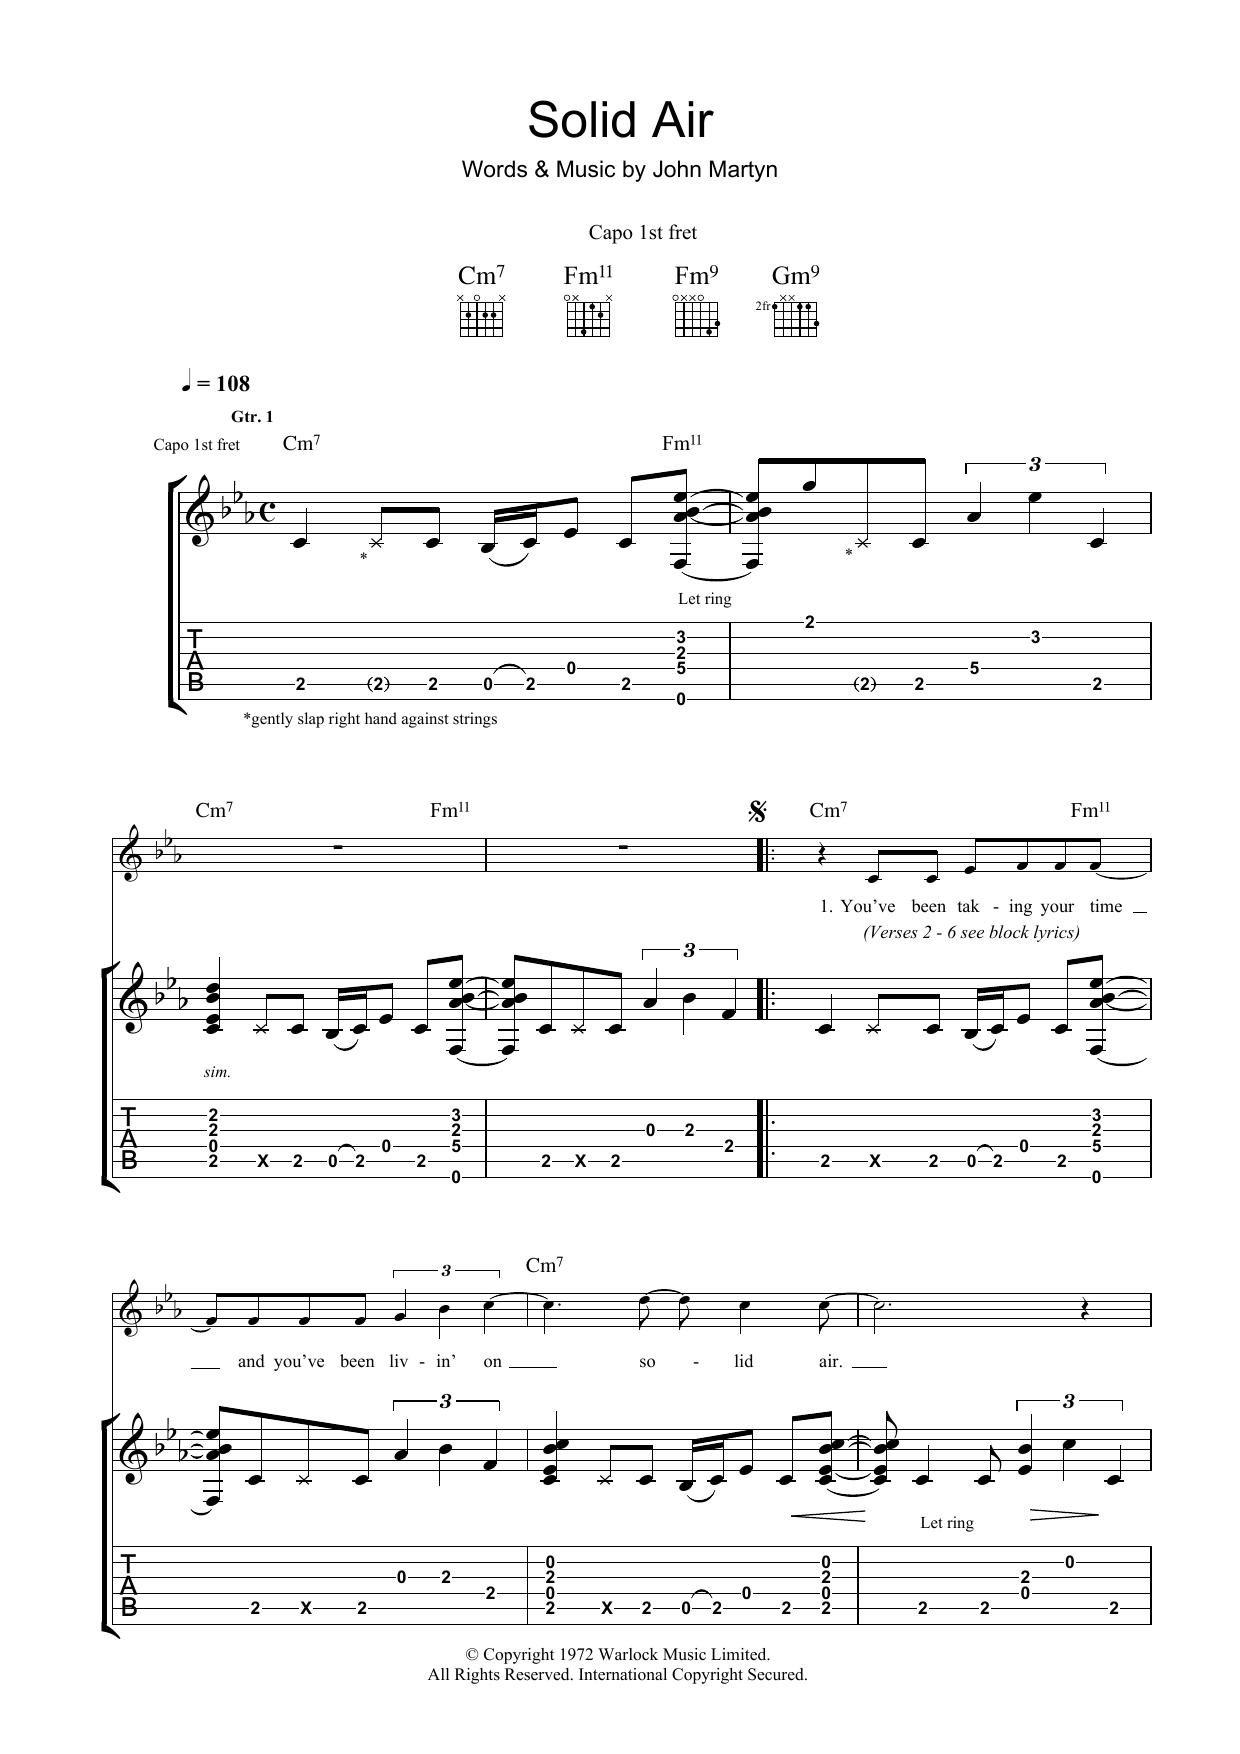 Solid Air Sheet Music